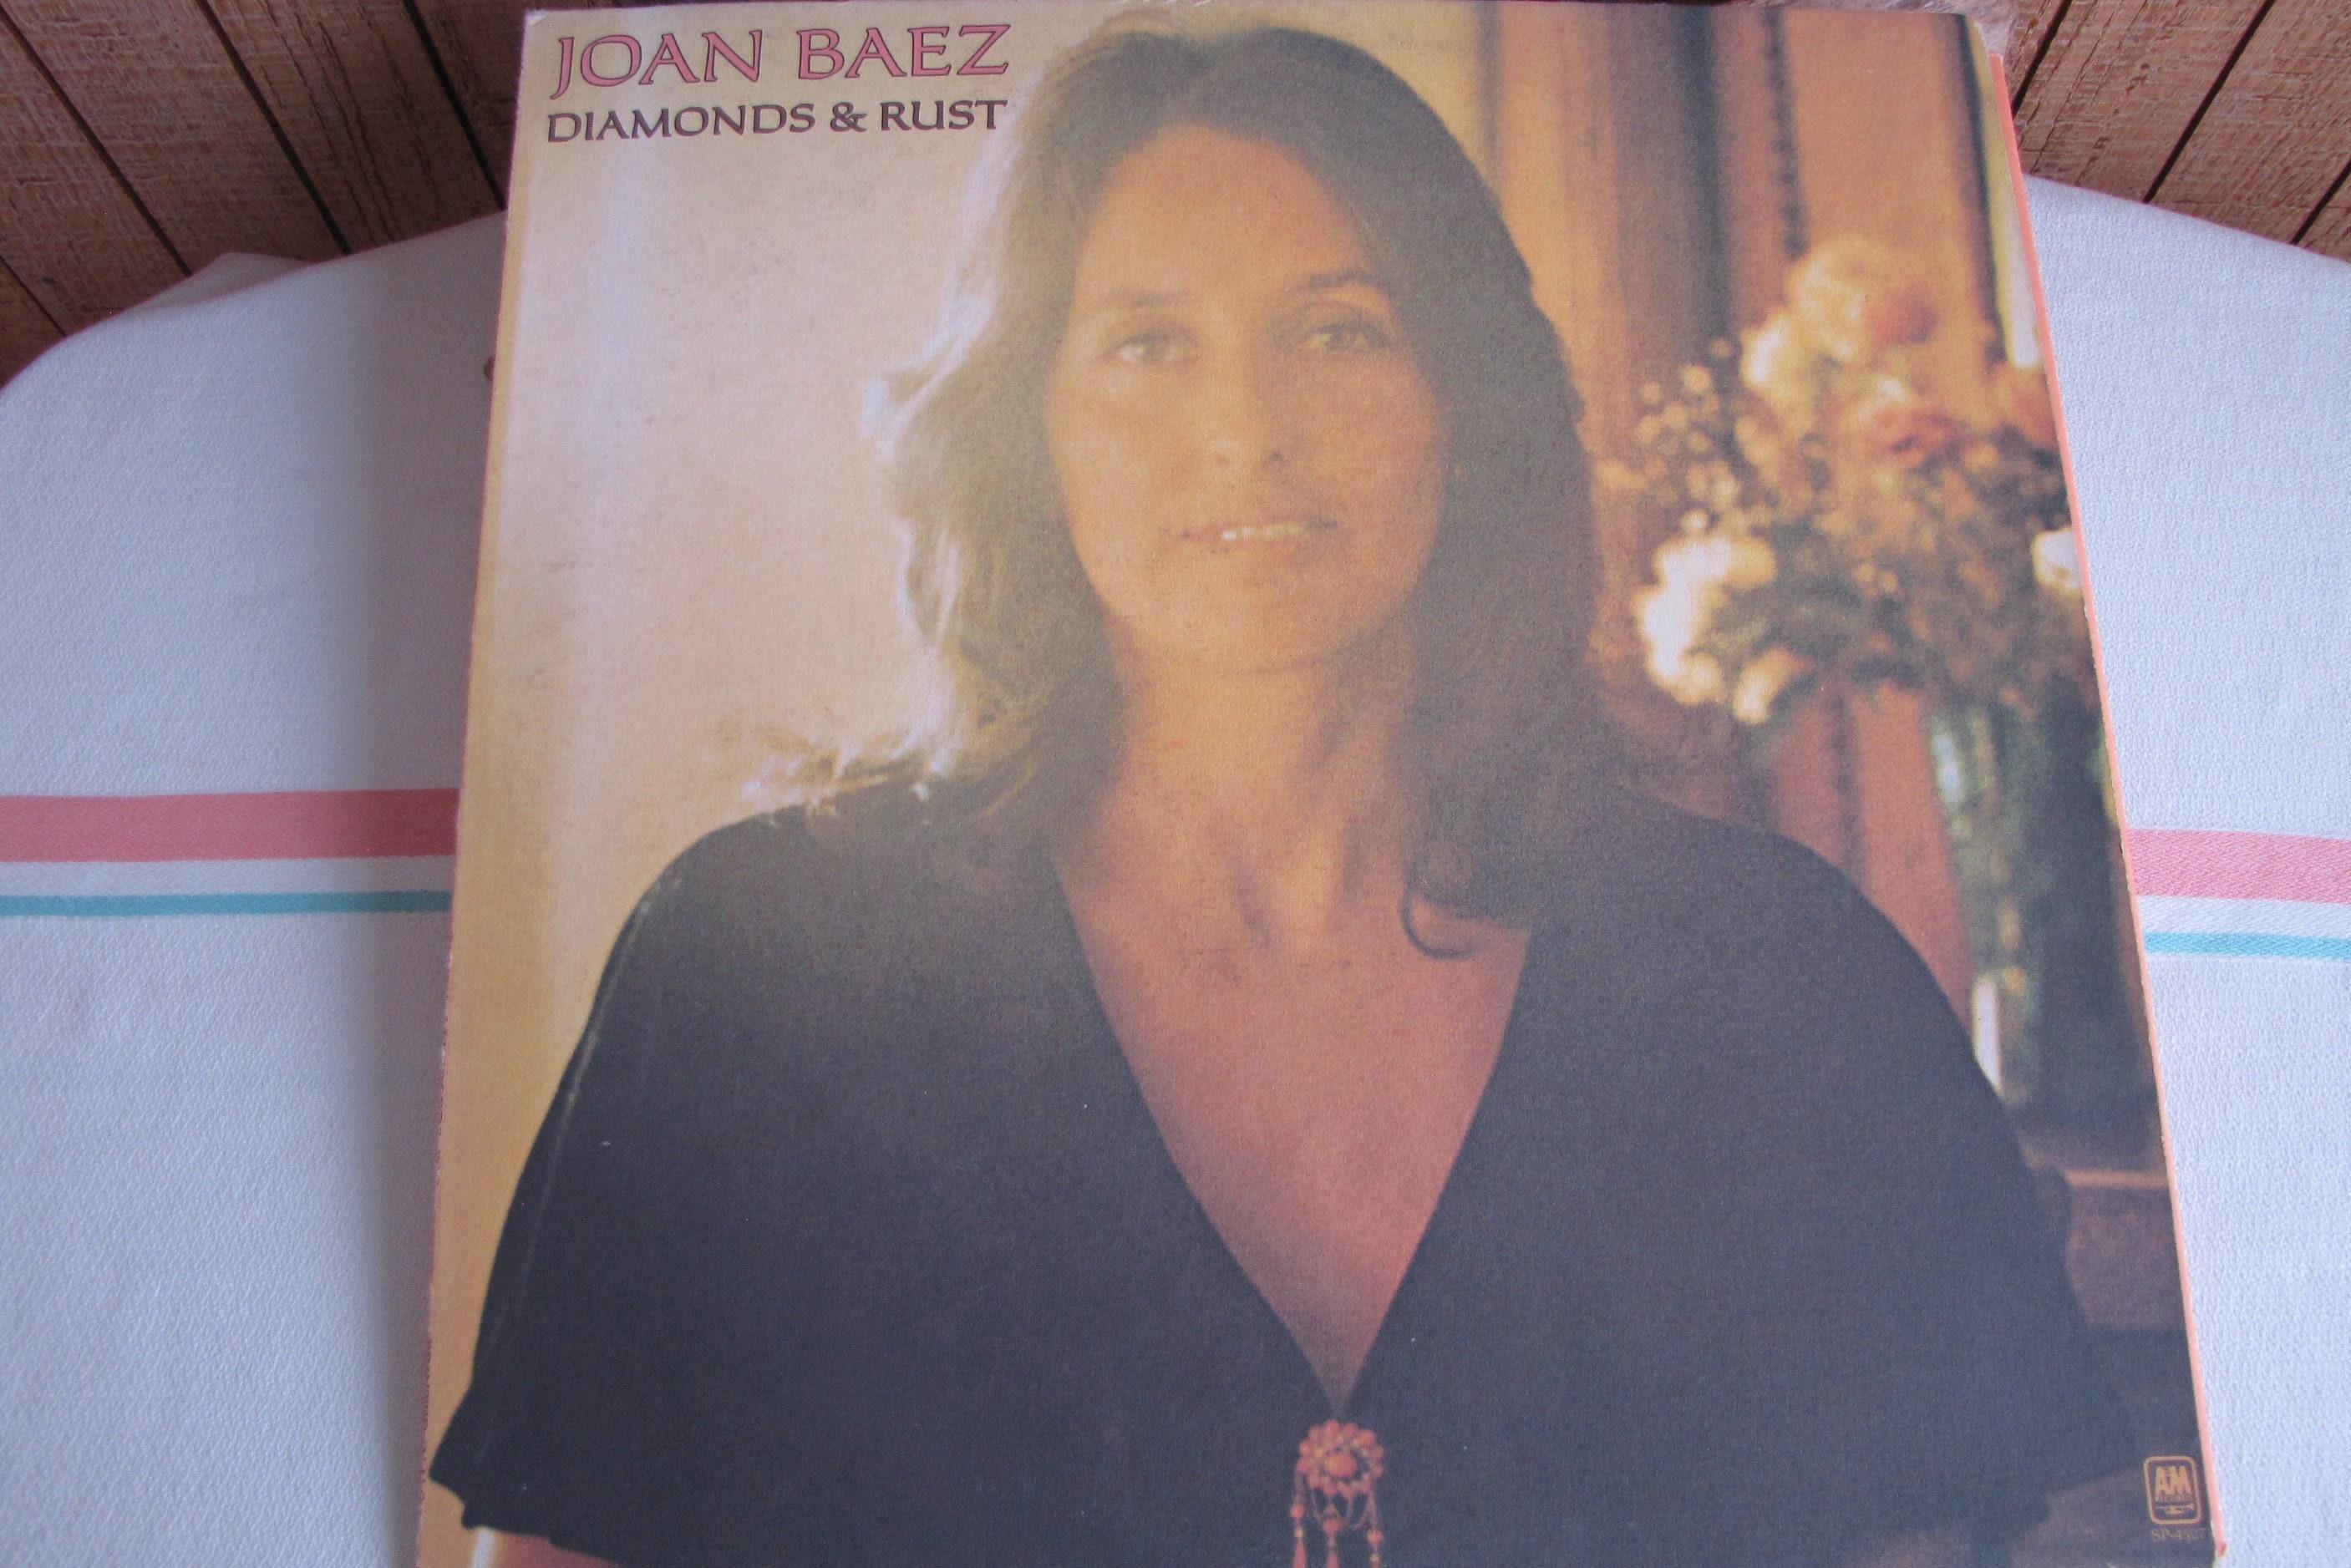 Joan Baez Diamonds and Rust Album Vintage Music and Vinyl 1975